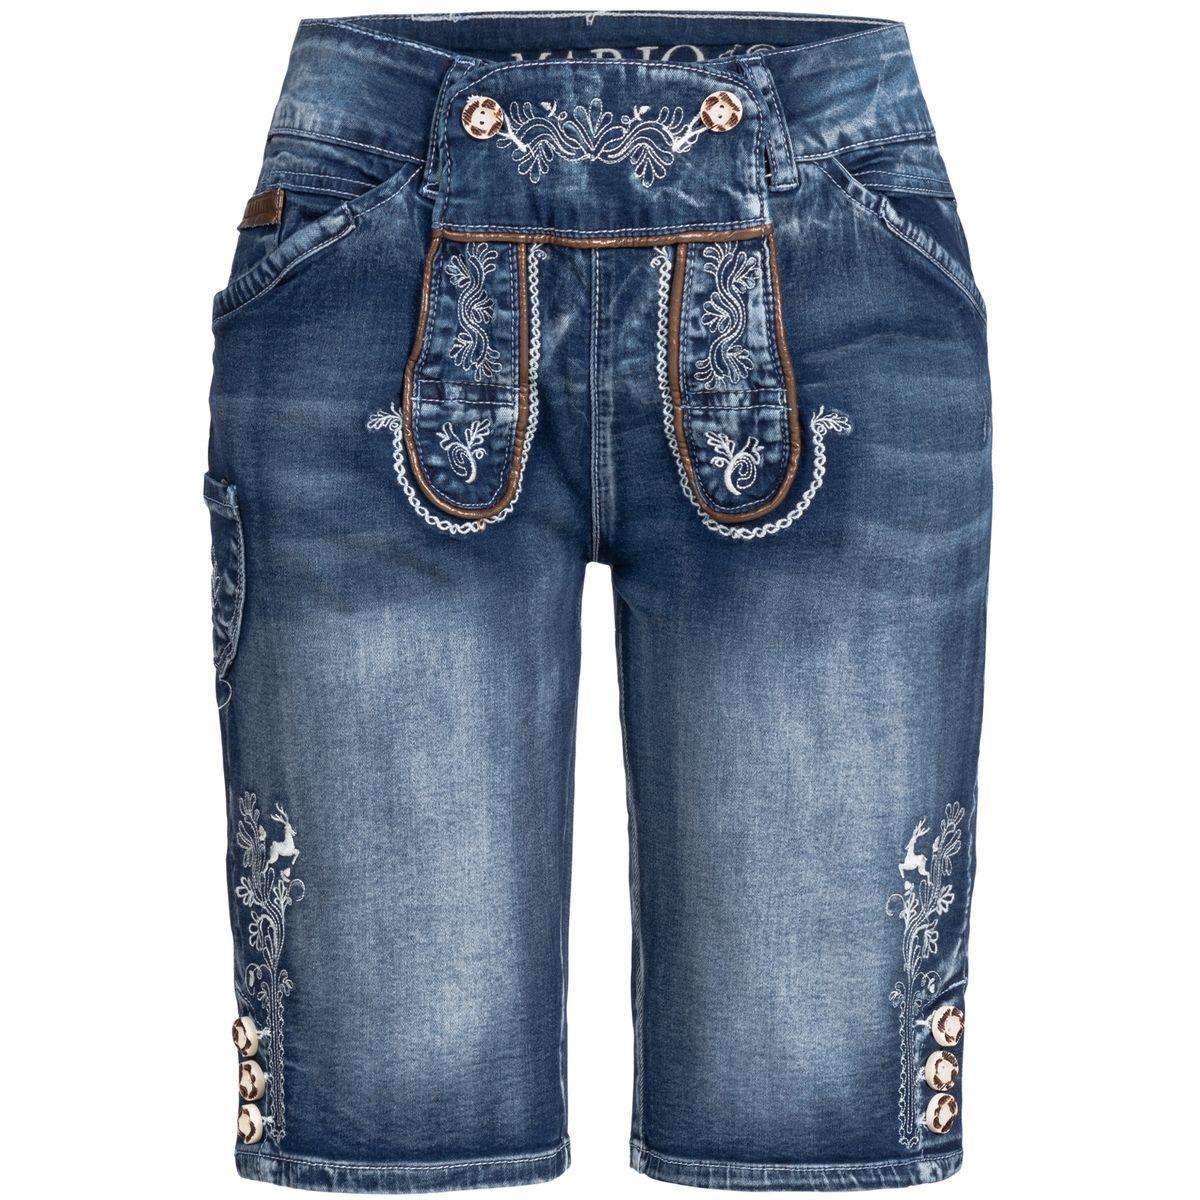 Jeans-Lederhose Gustl Short in Blau von Marjo Trachten